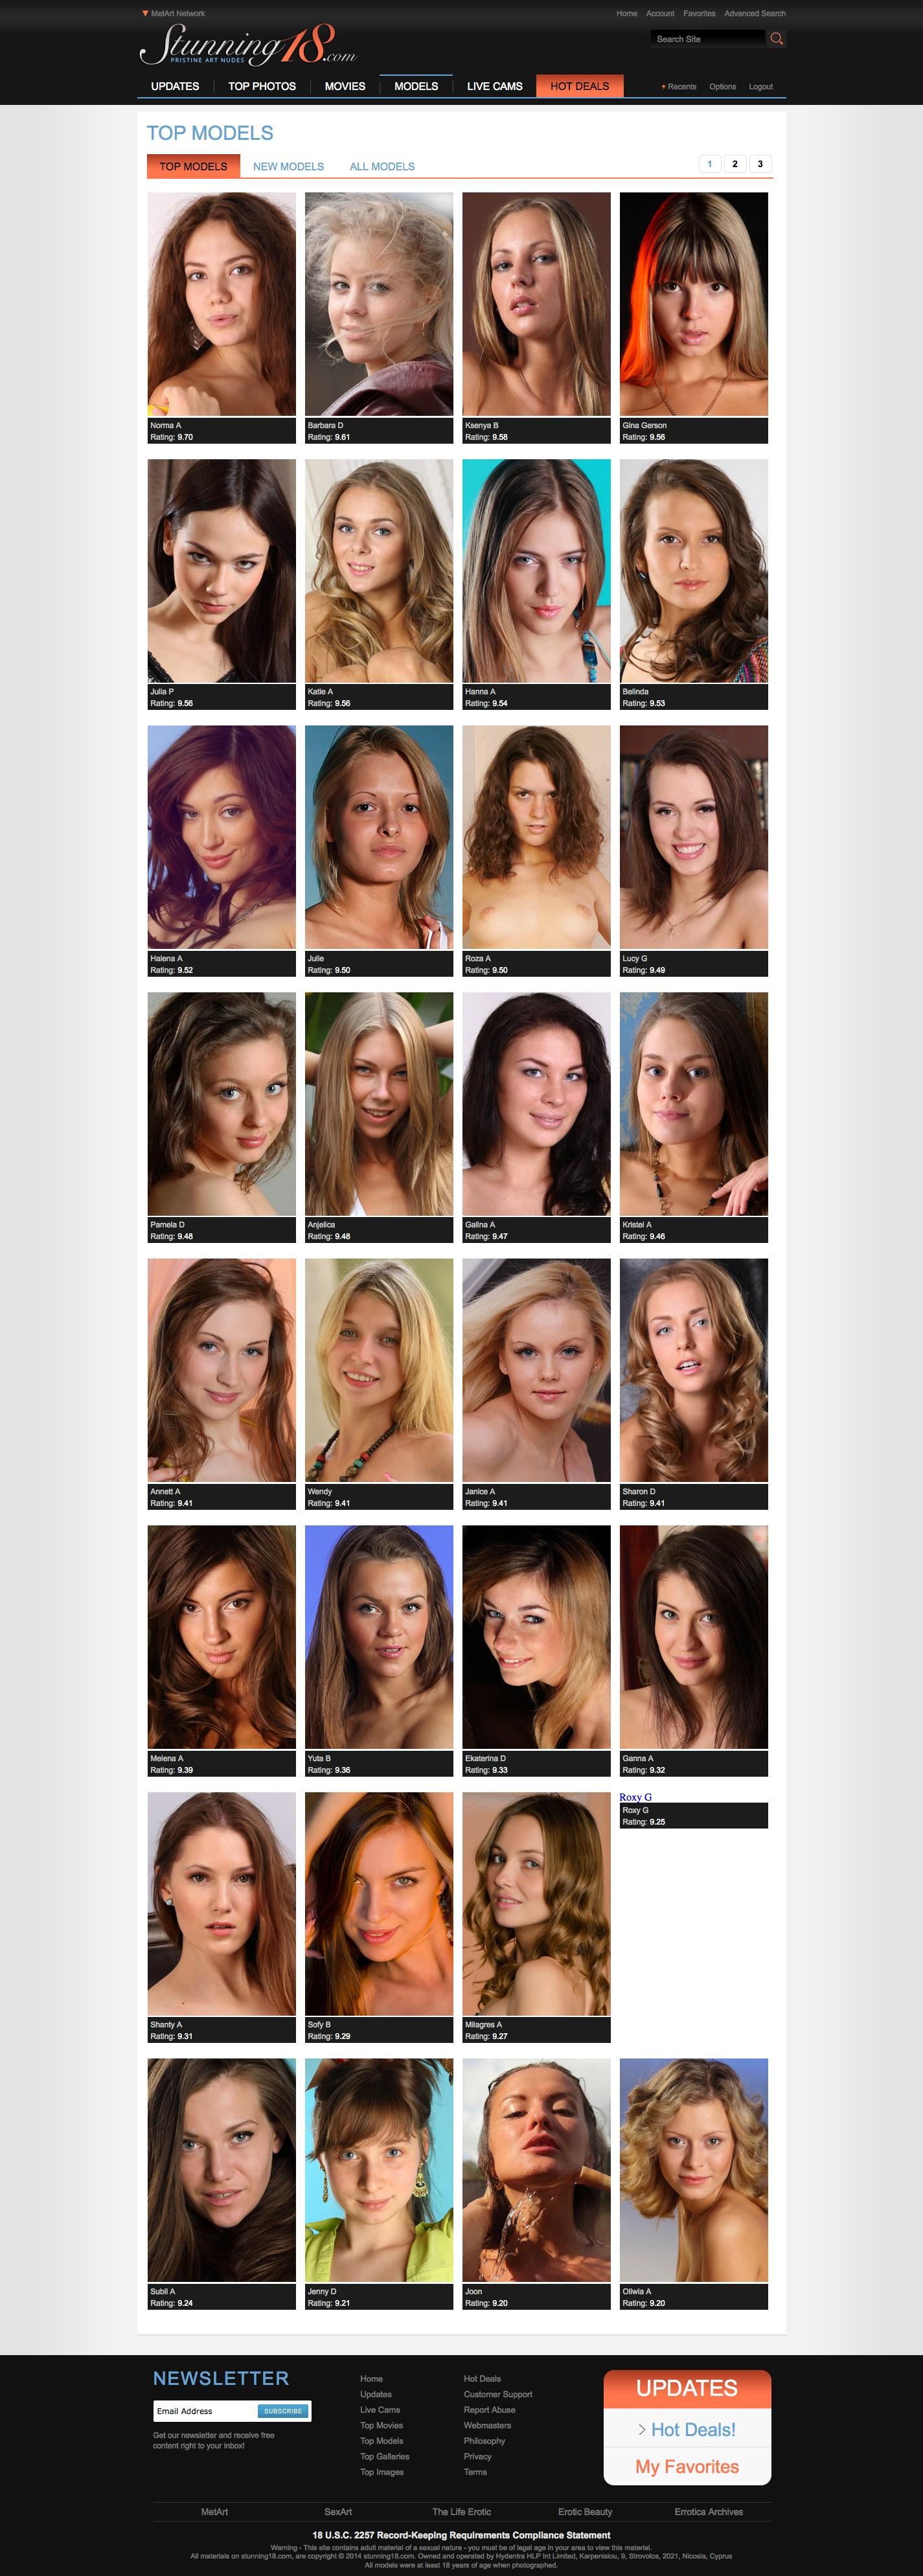 Stunning 18 models